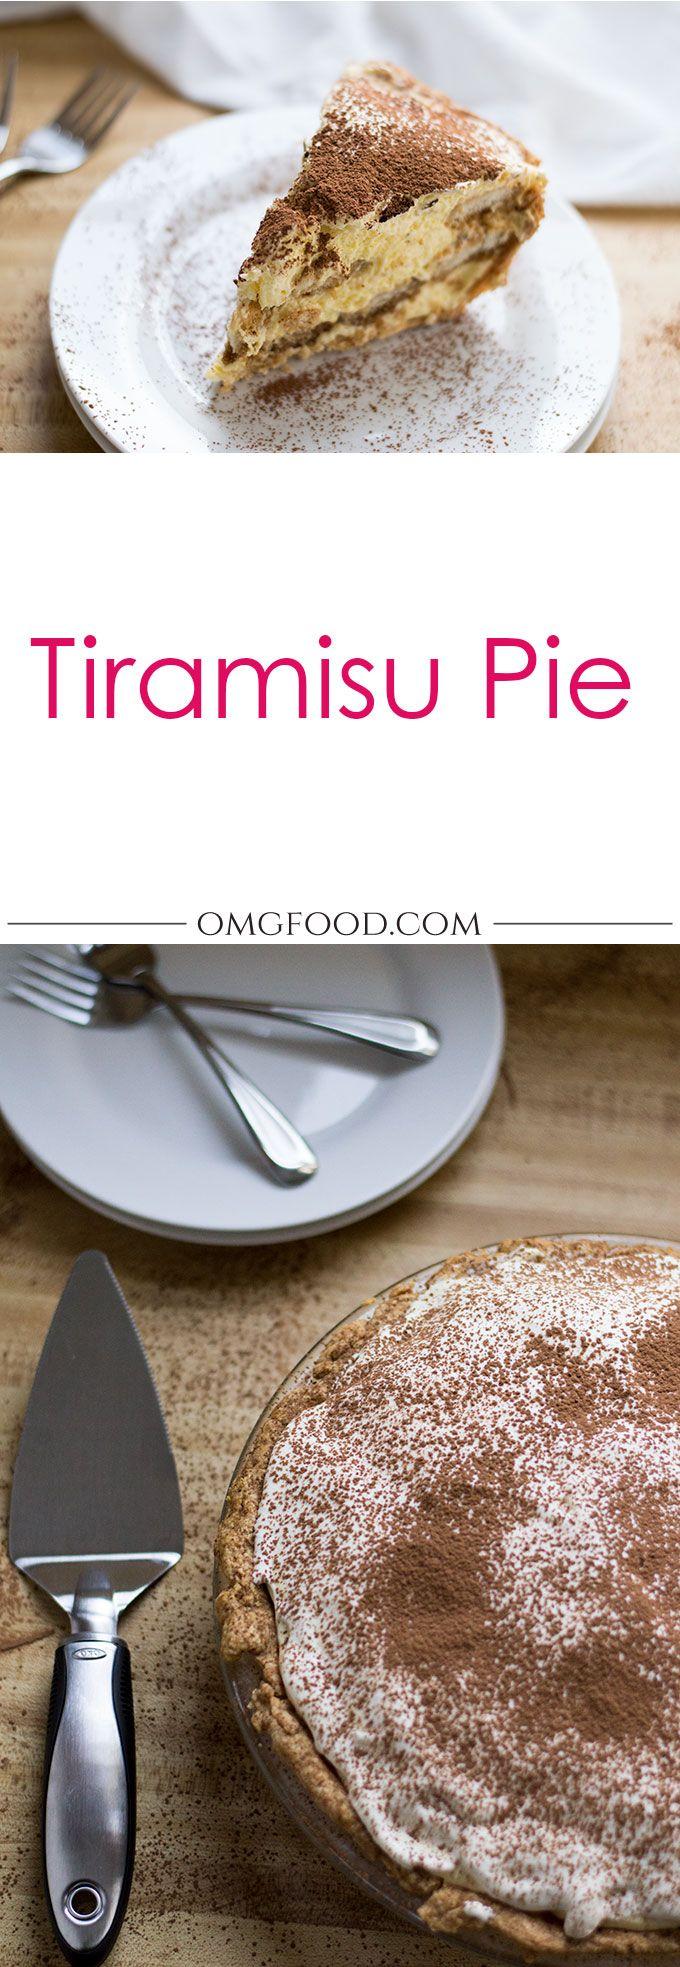 Tiramisu Pie | omgfood.com